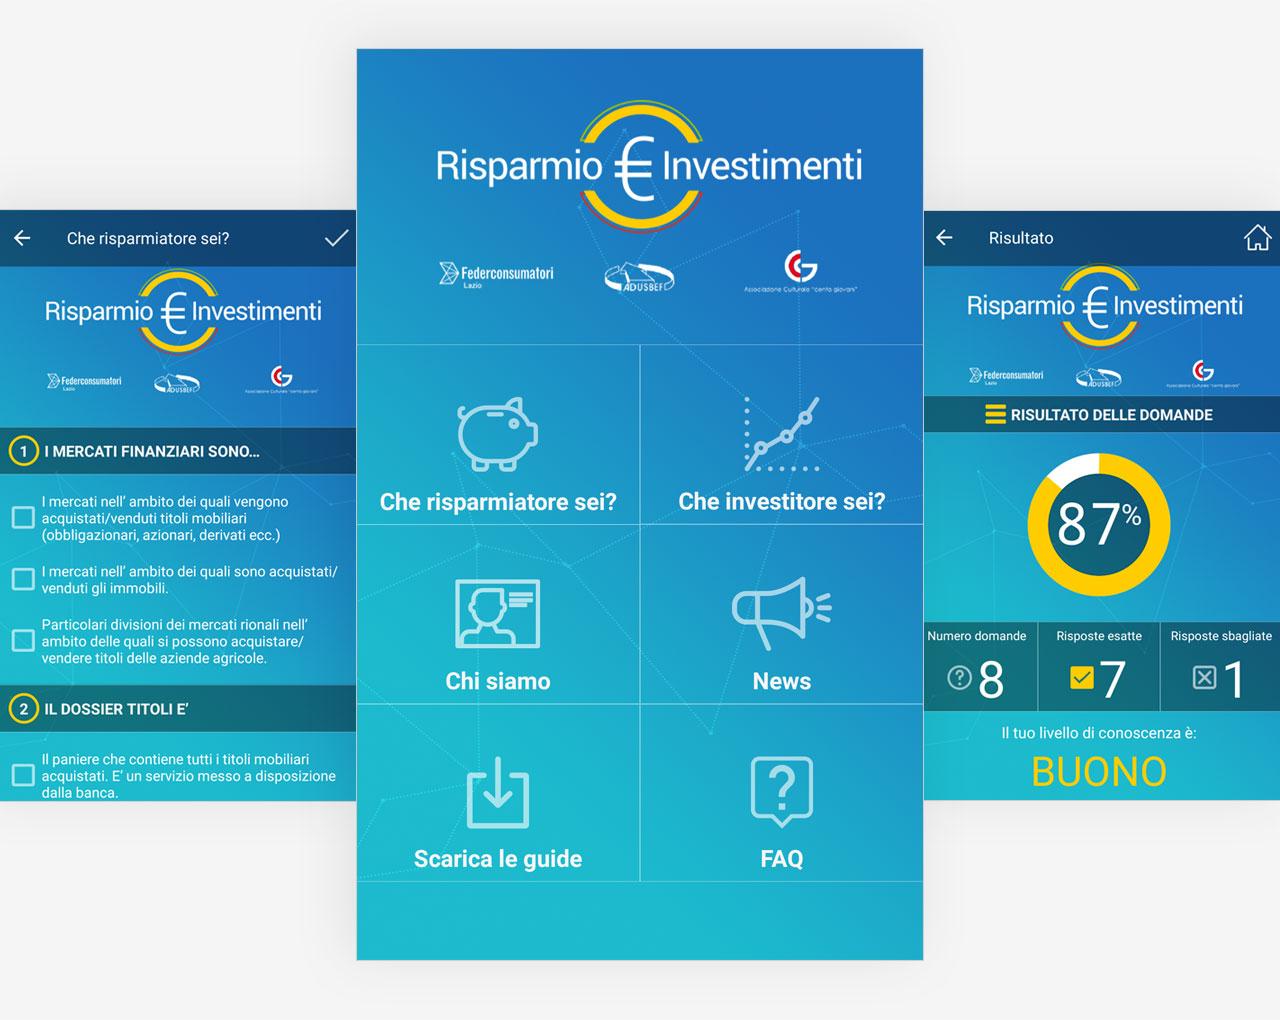 App Risparmio € Investimenti by federconsumatori